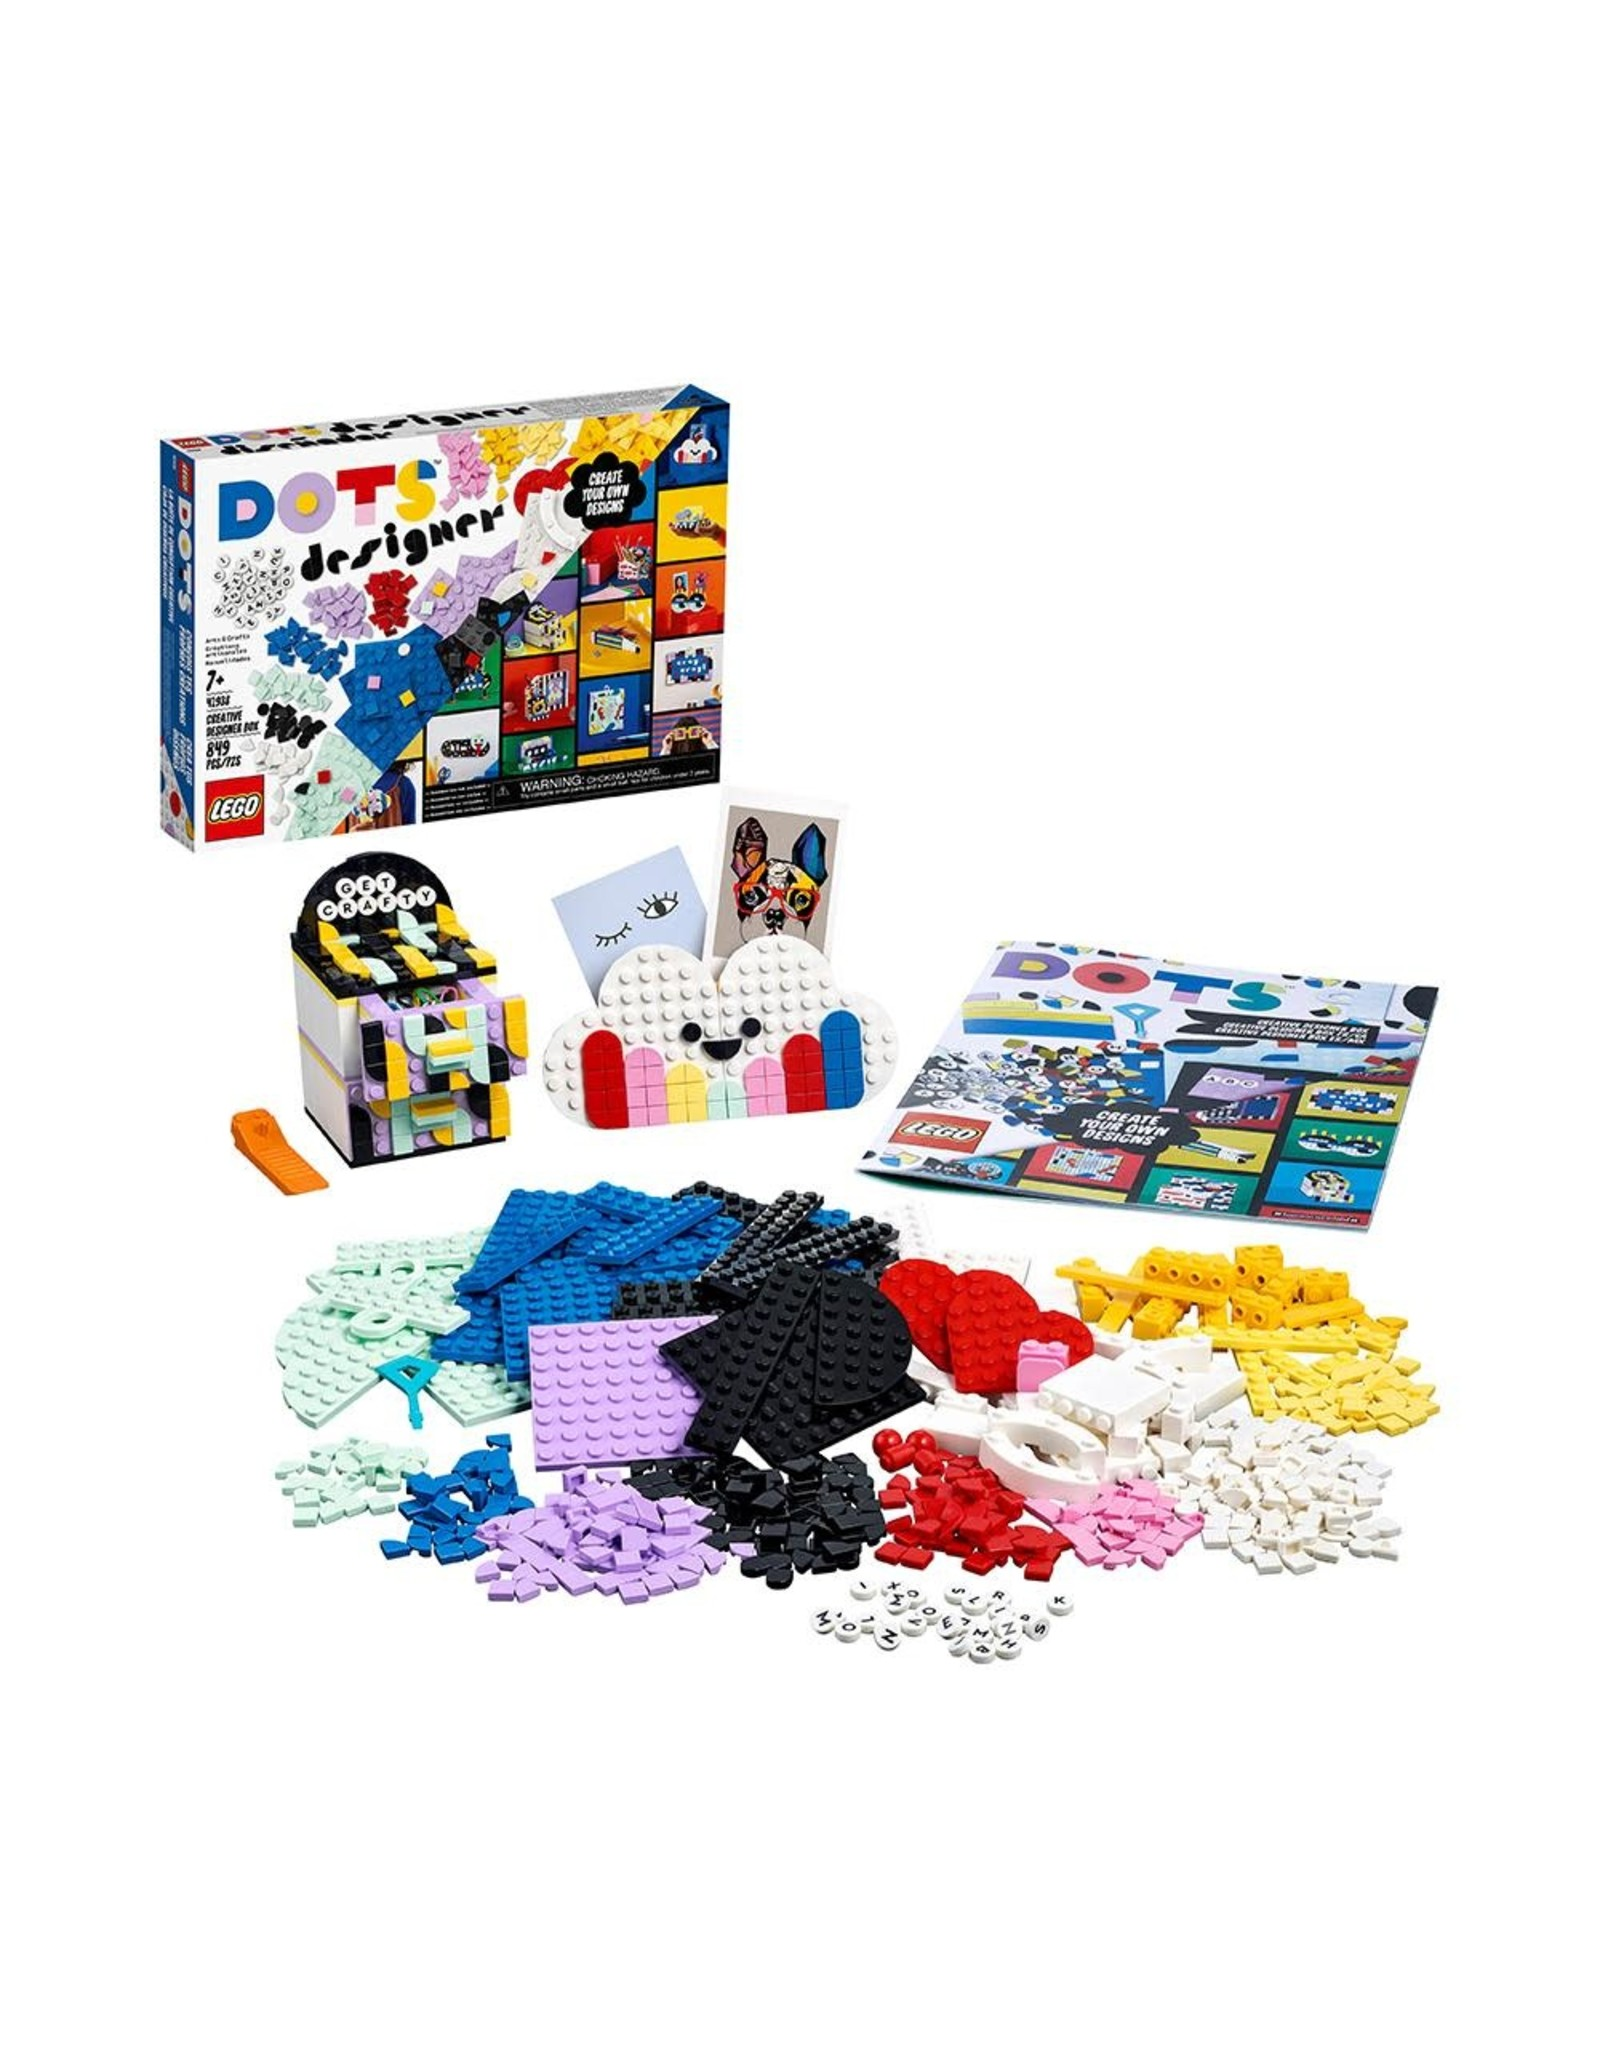 LEGO Dots - 41938 Creative Designer Box